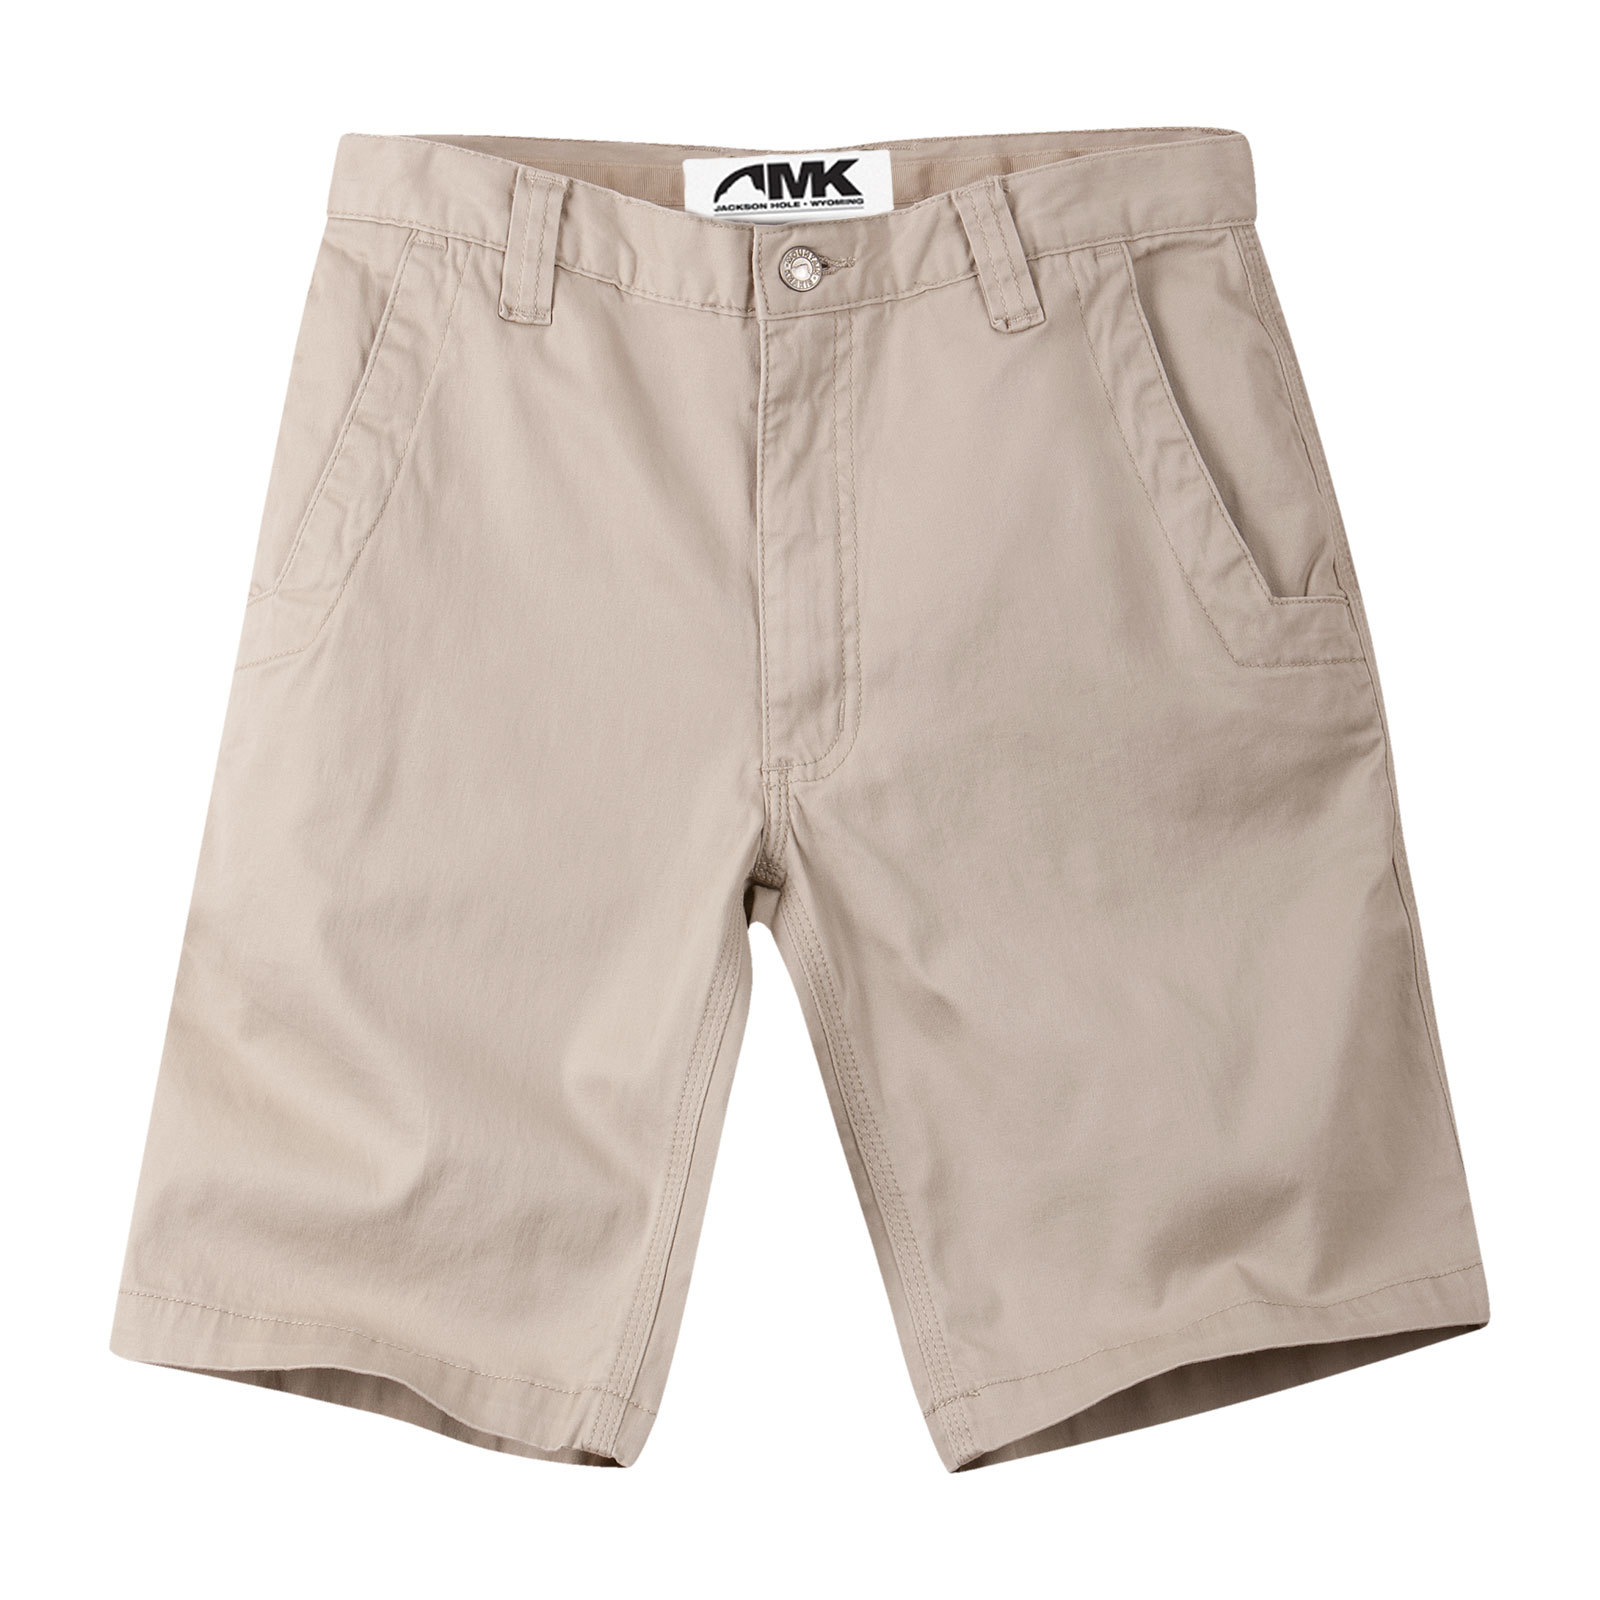 Men's Lake Lodge Twill Short Relaxed Fit - Mountain Khakis